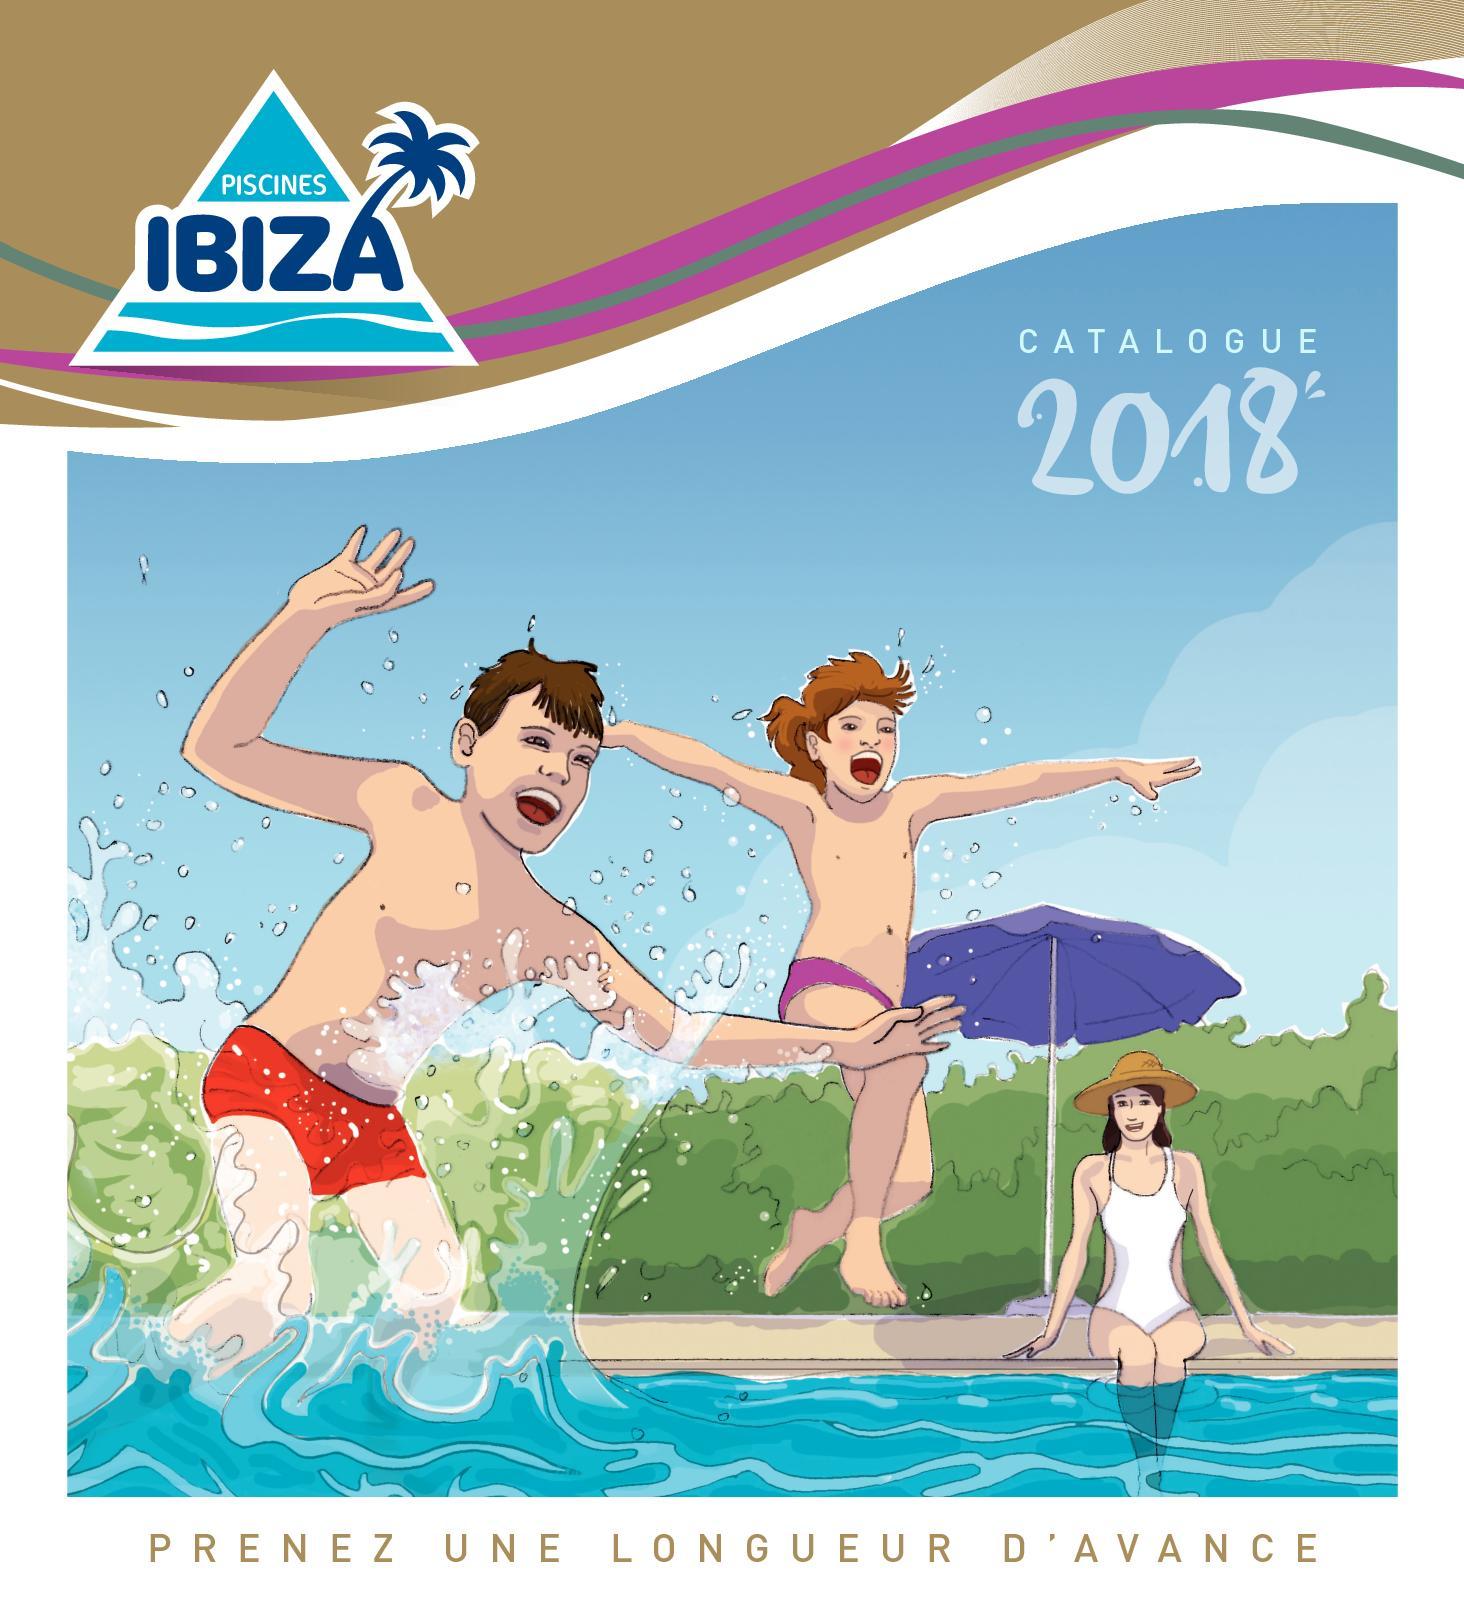 Calameo Piscines Ibiza Catalogue Produits 2018